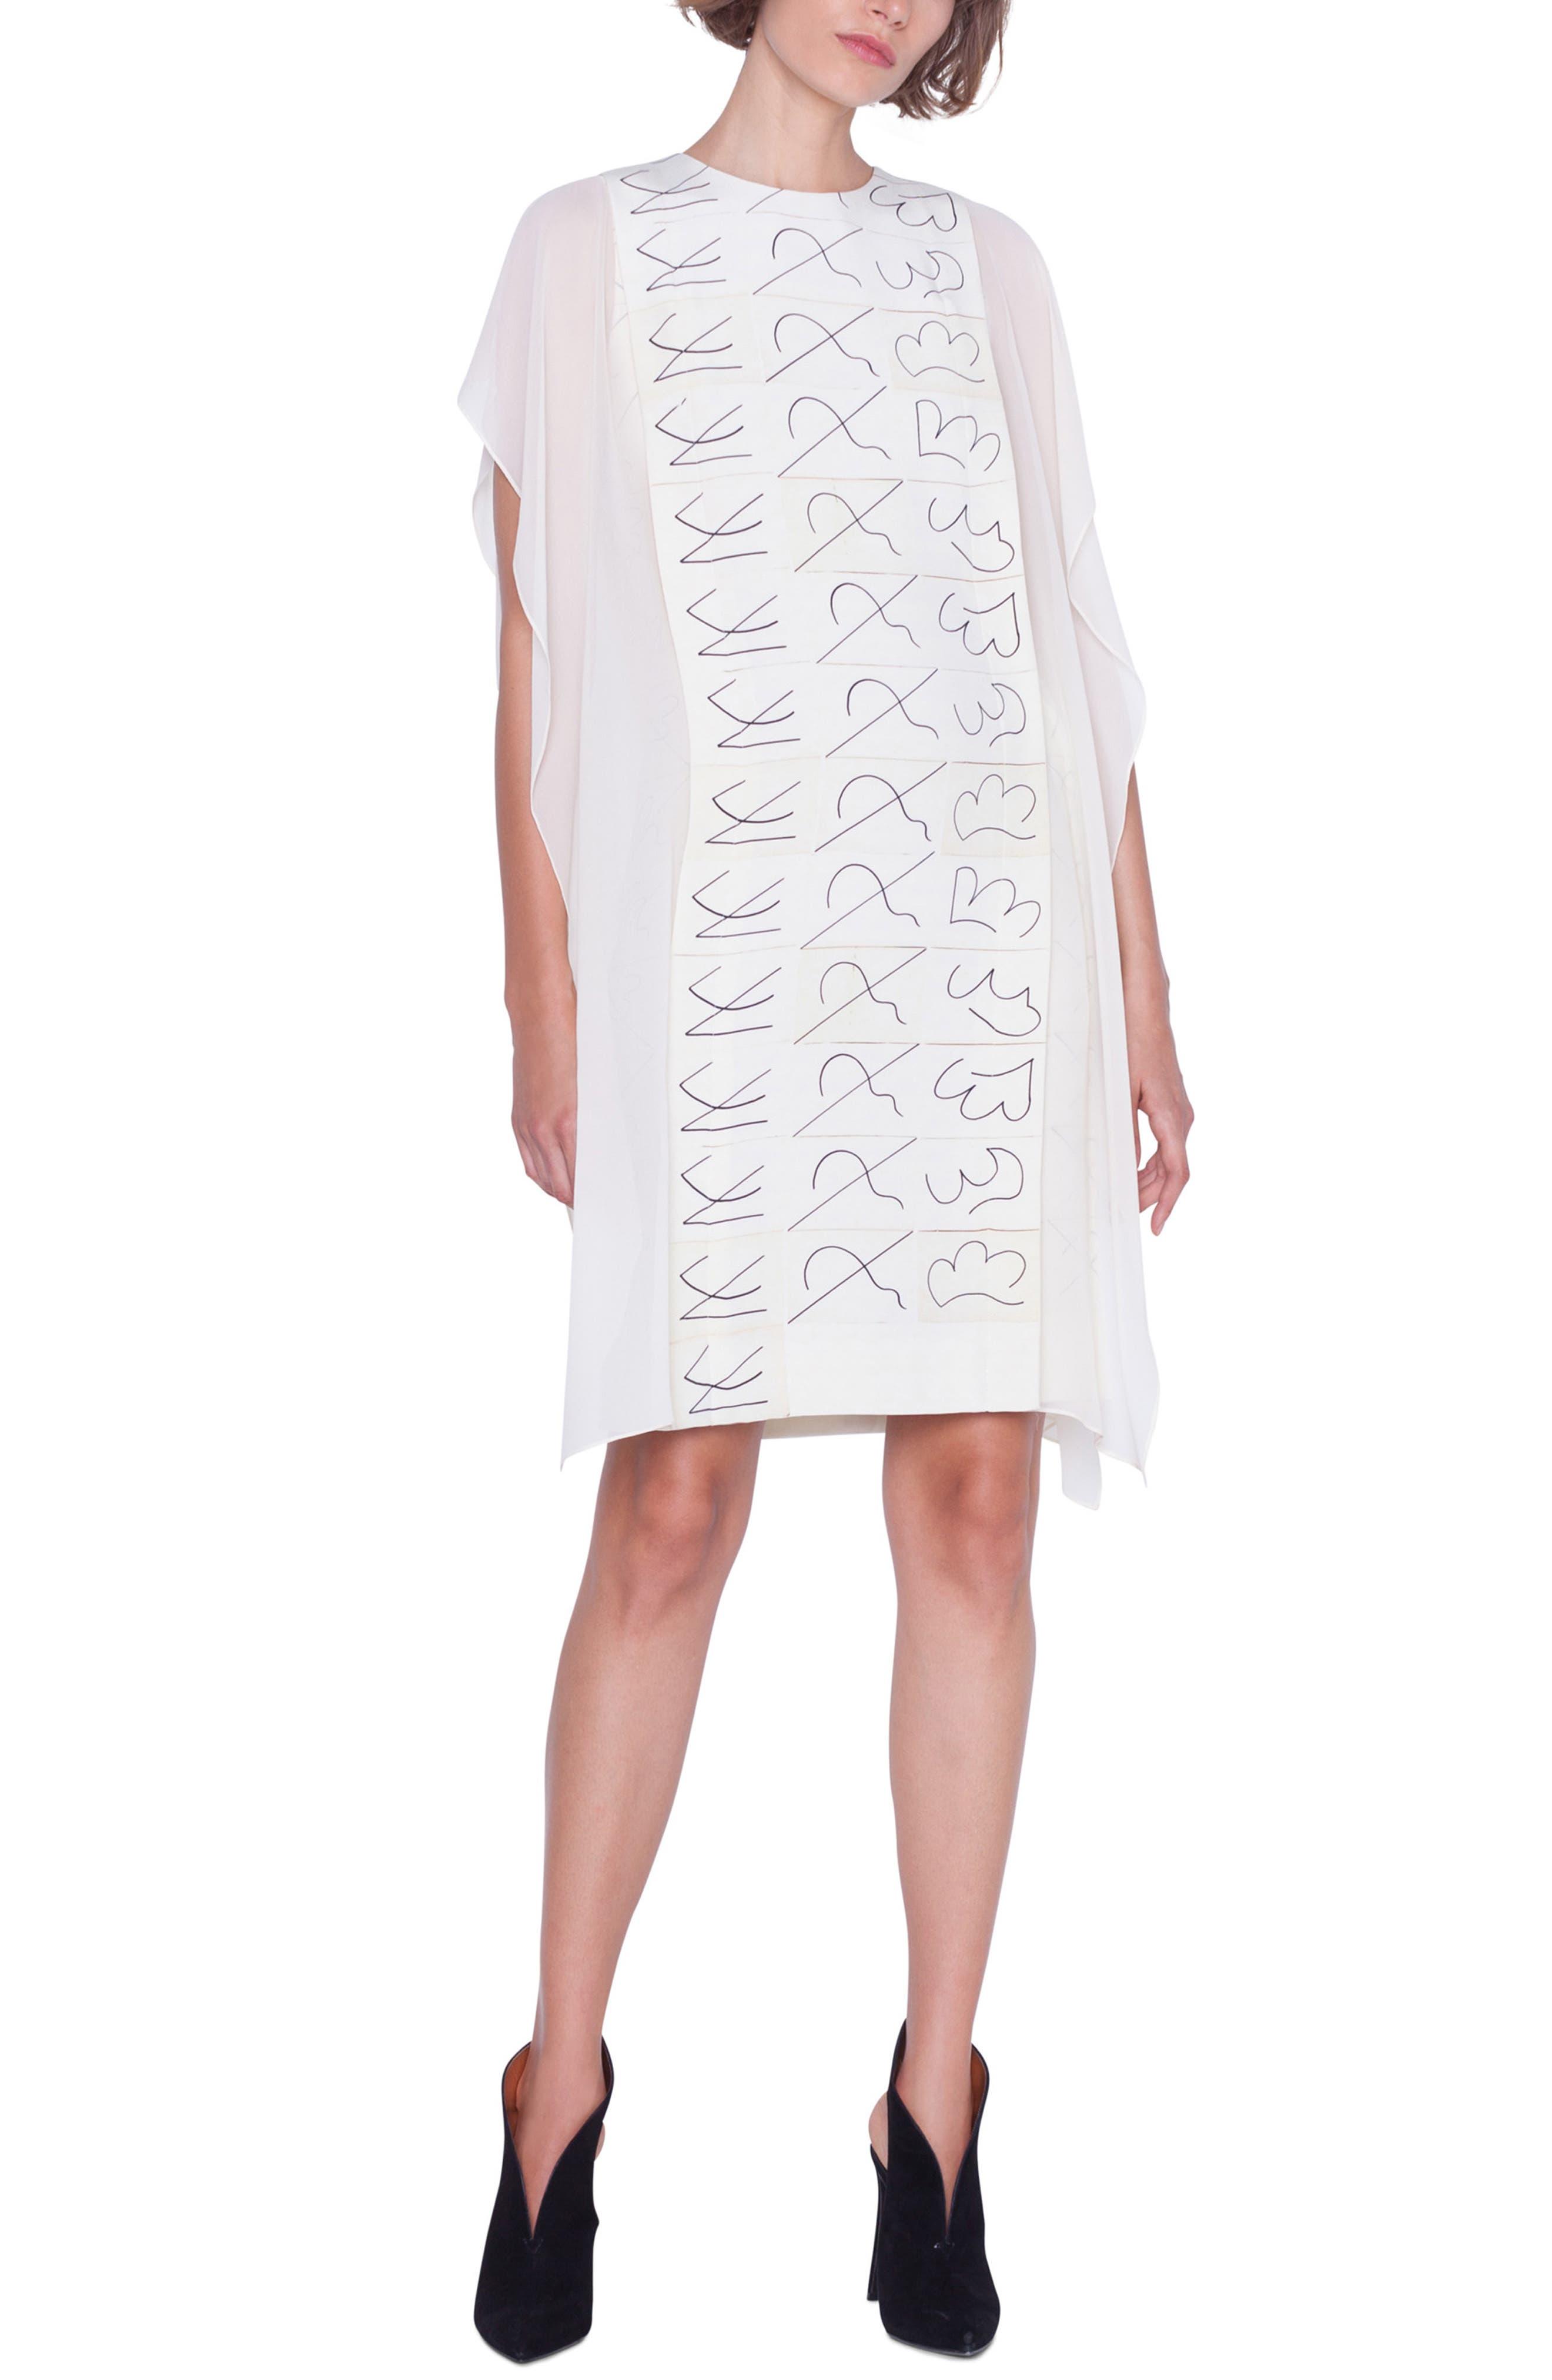 AKRIS, Leporello Print Cold Shoulder Silk Dress, Alternate thumbnail 6, color, PAPER